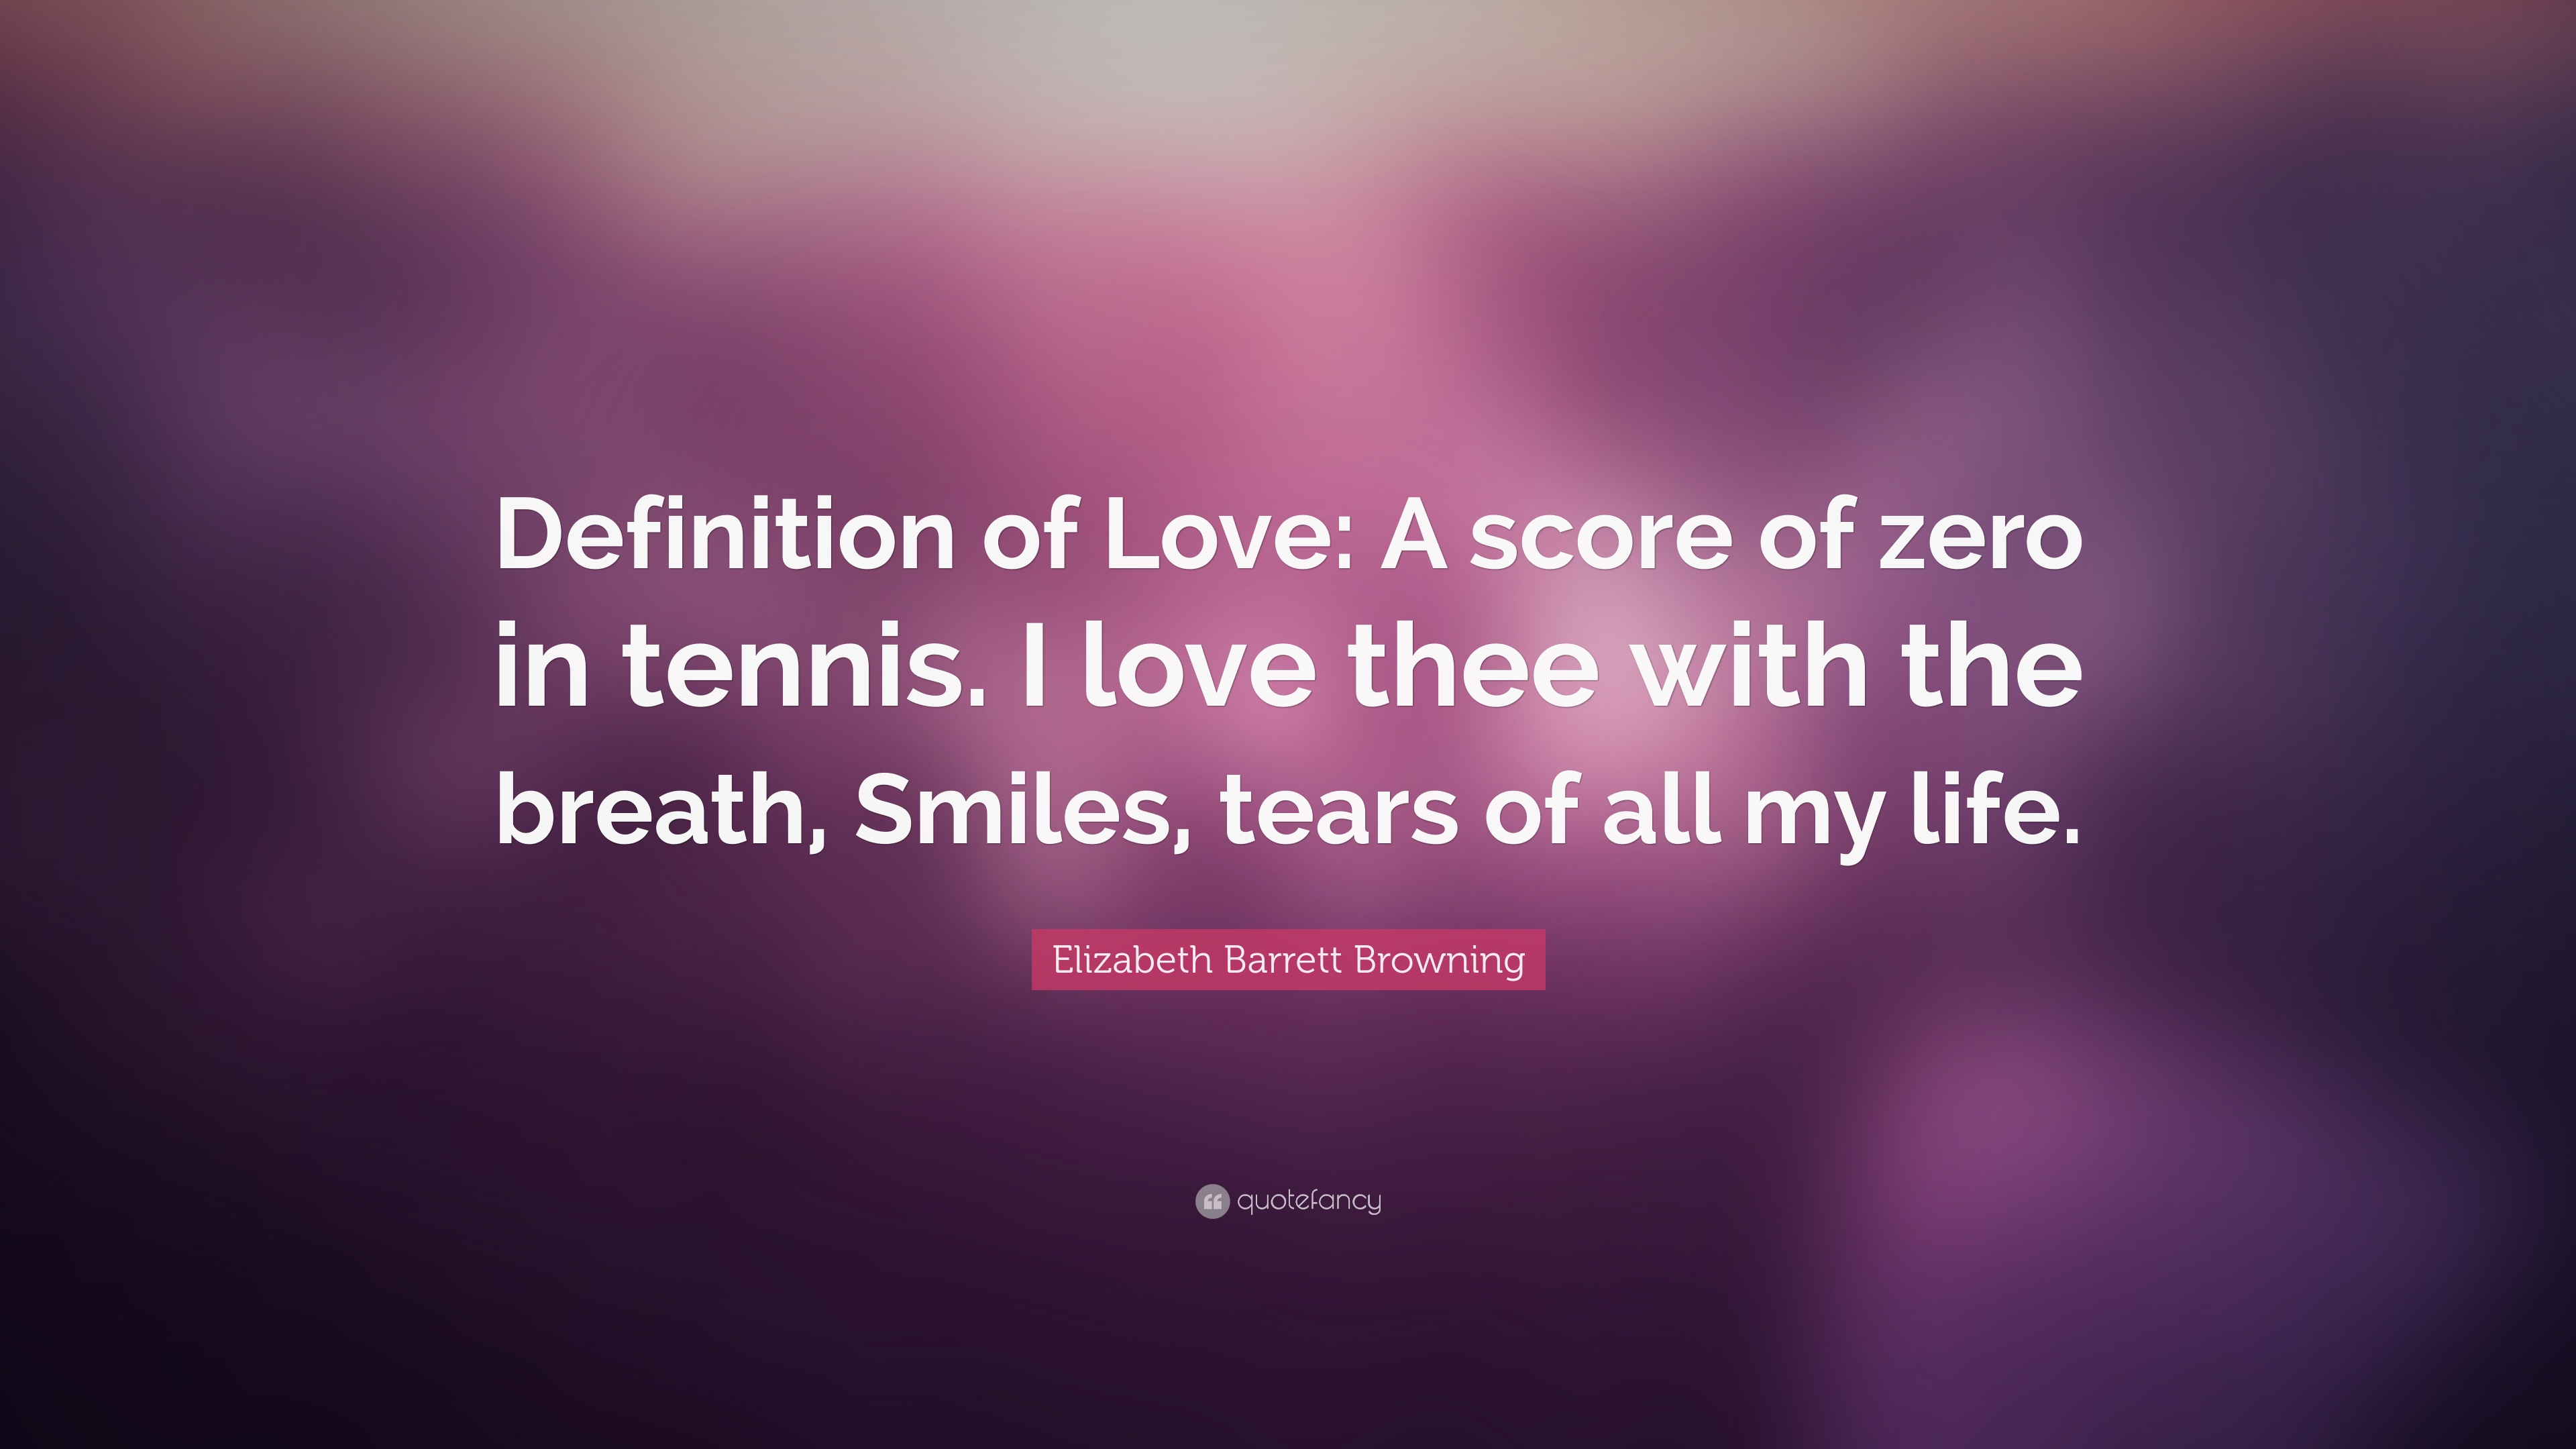 a definition of beloved